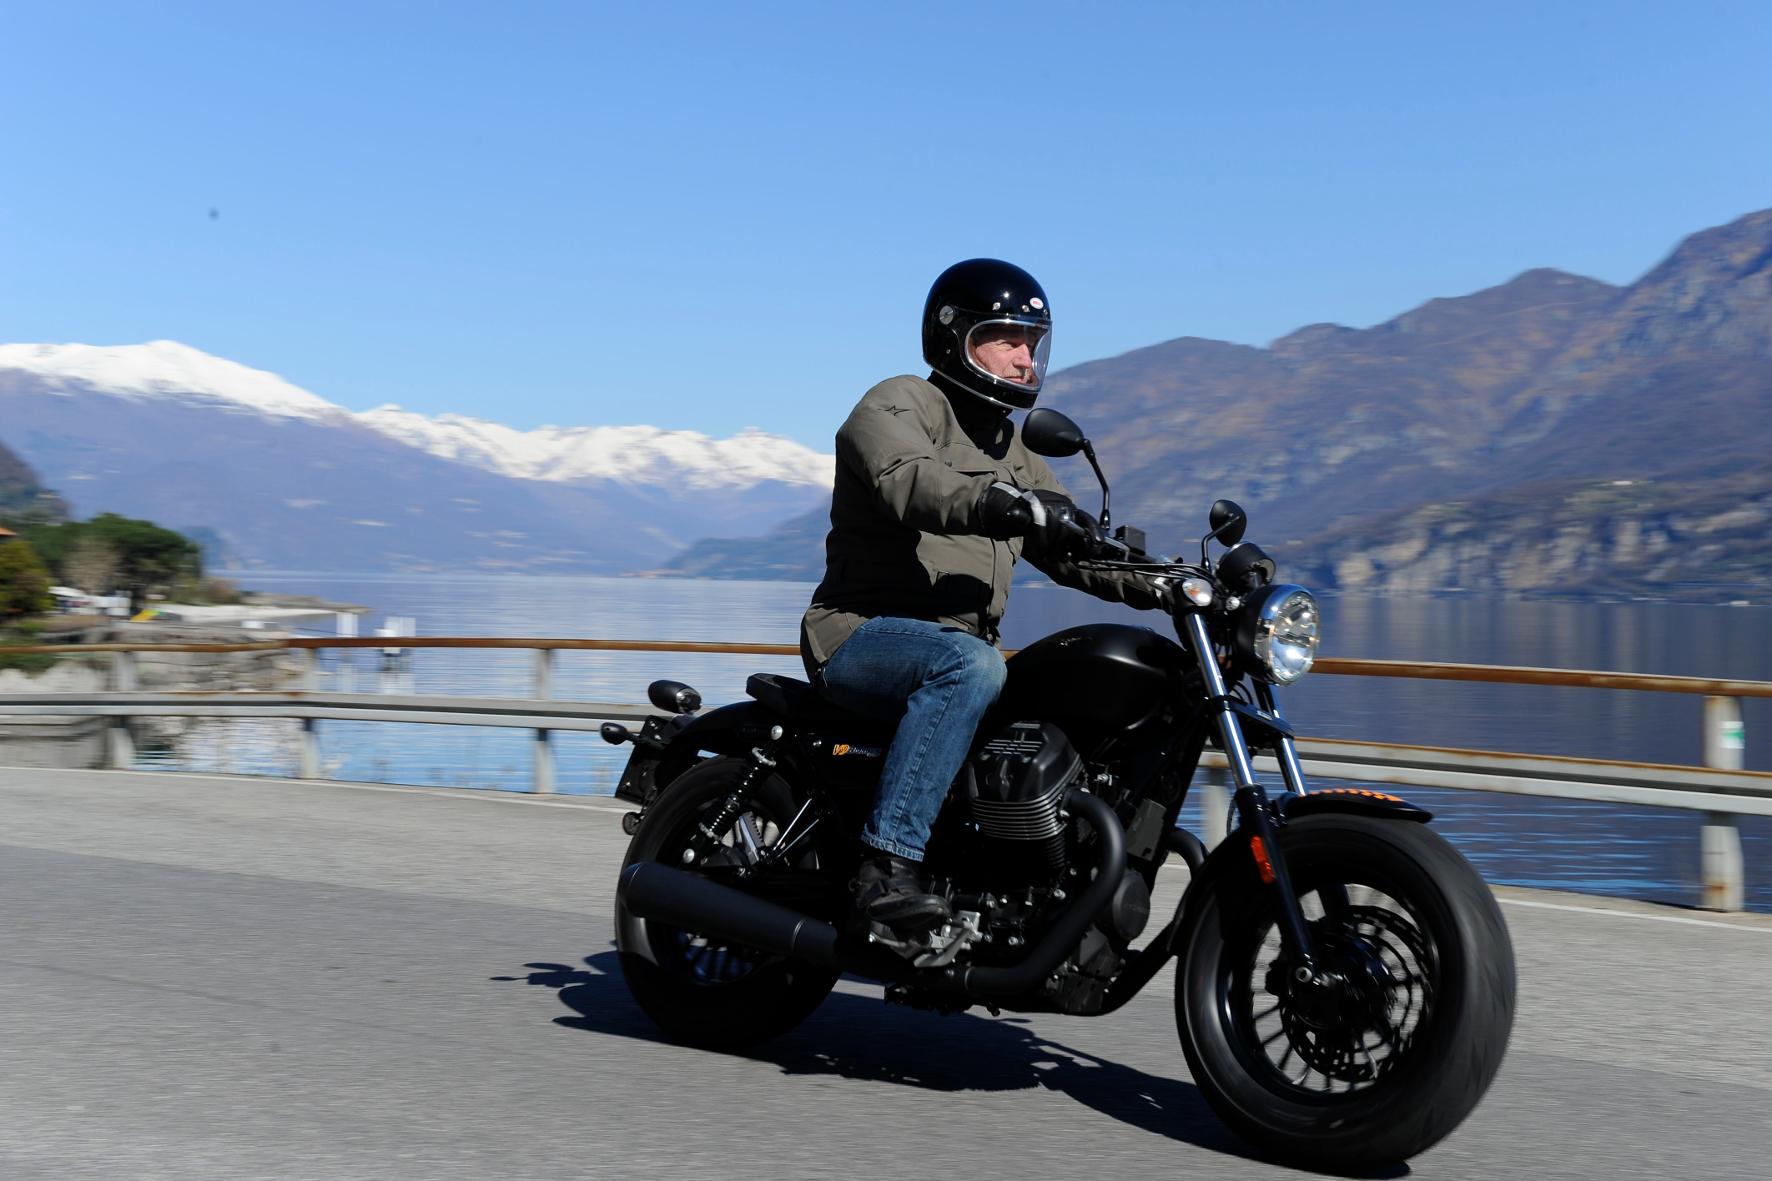 mid Mandello del Lario - Wieder da: Die Traditionsmarke Moto Guzzi wittert Morgenluft.